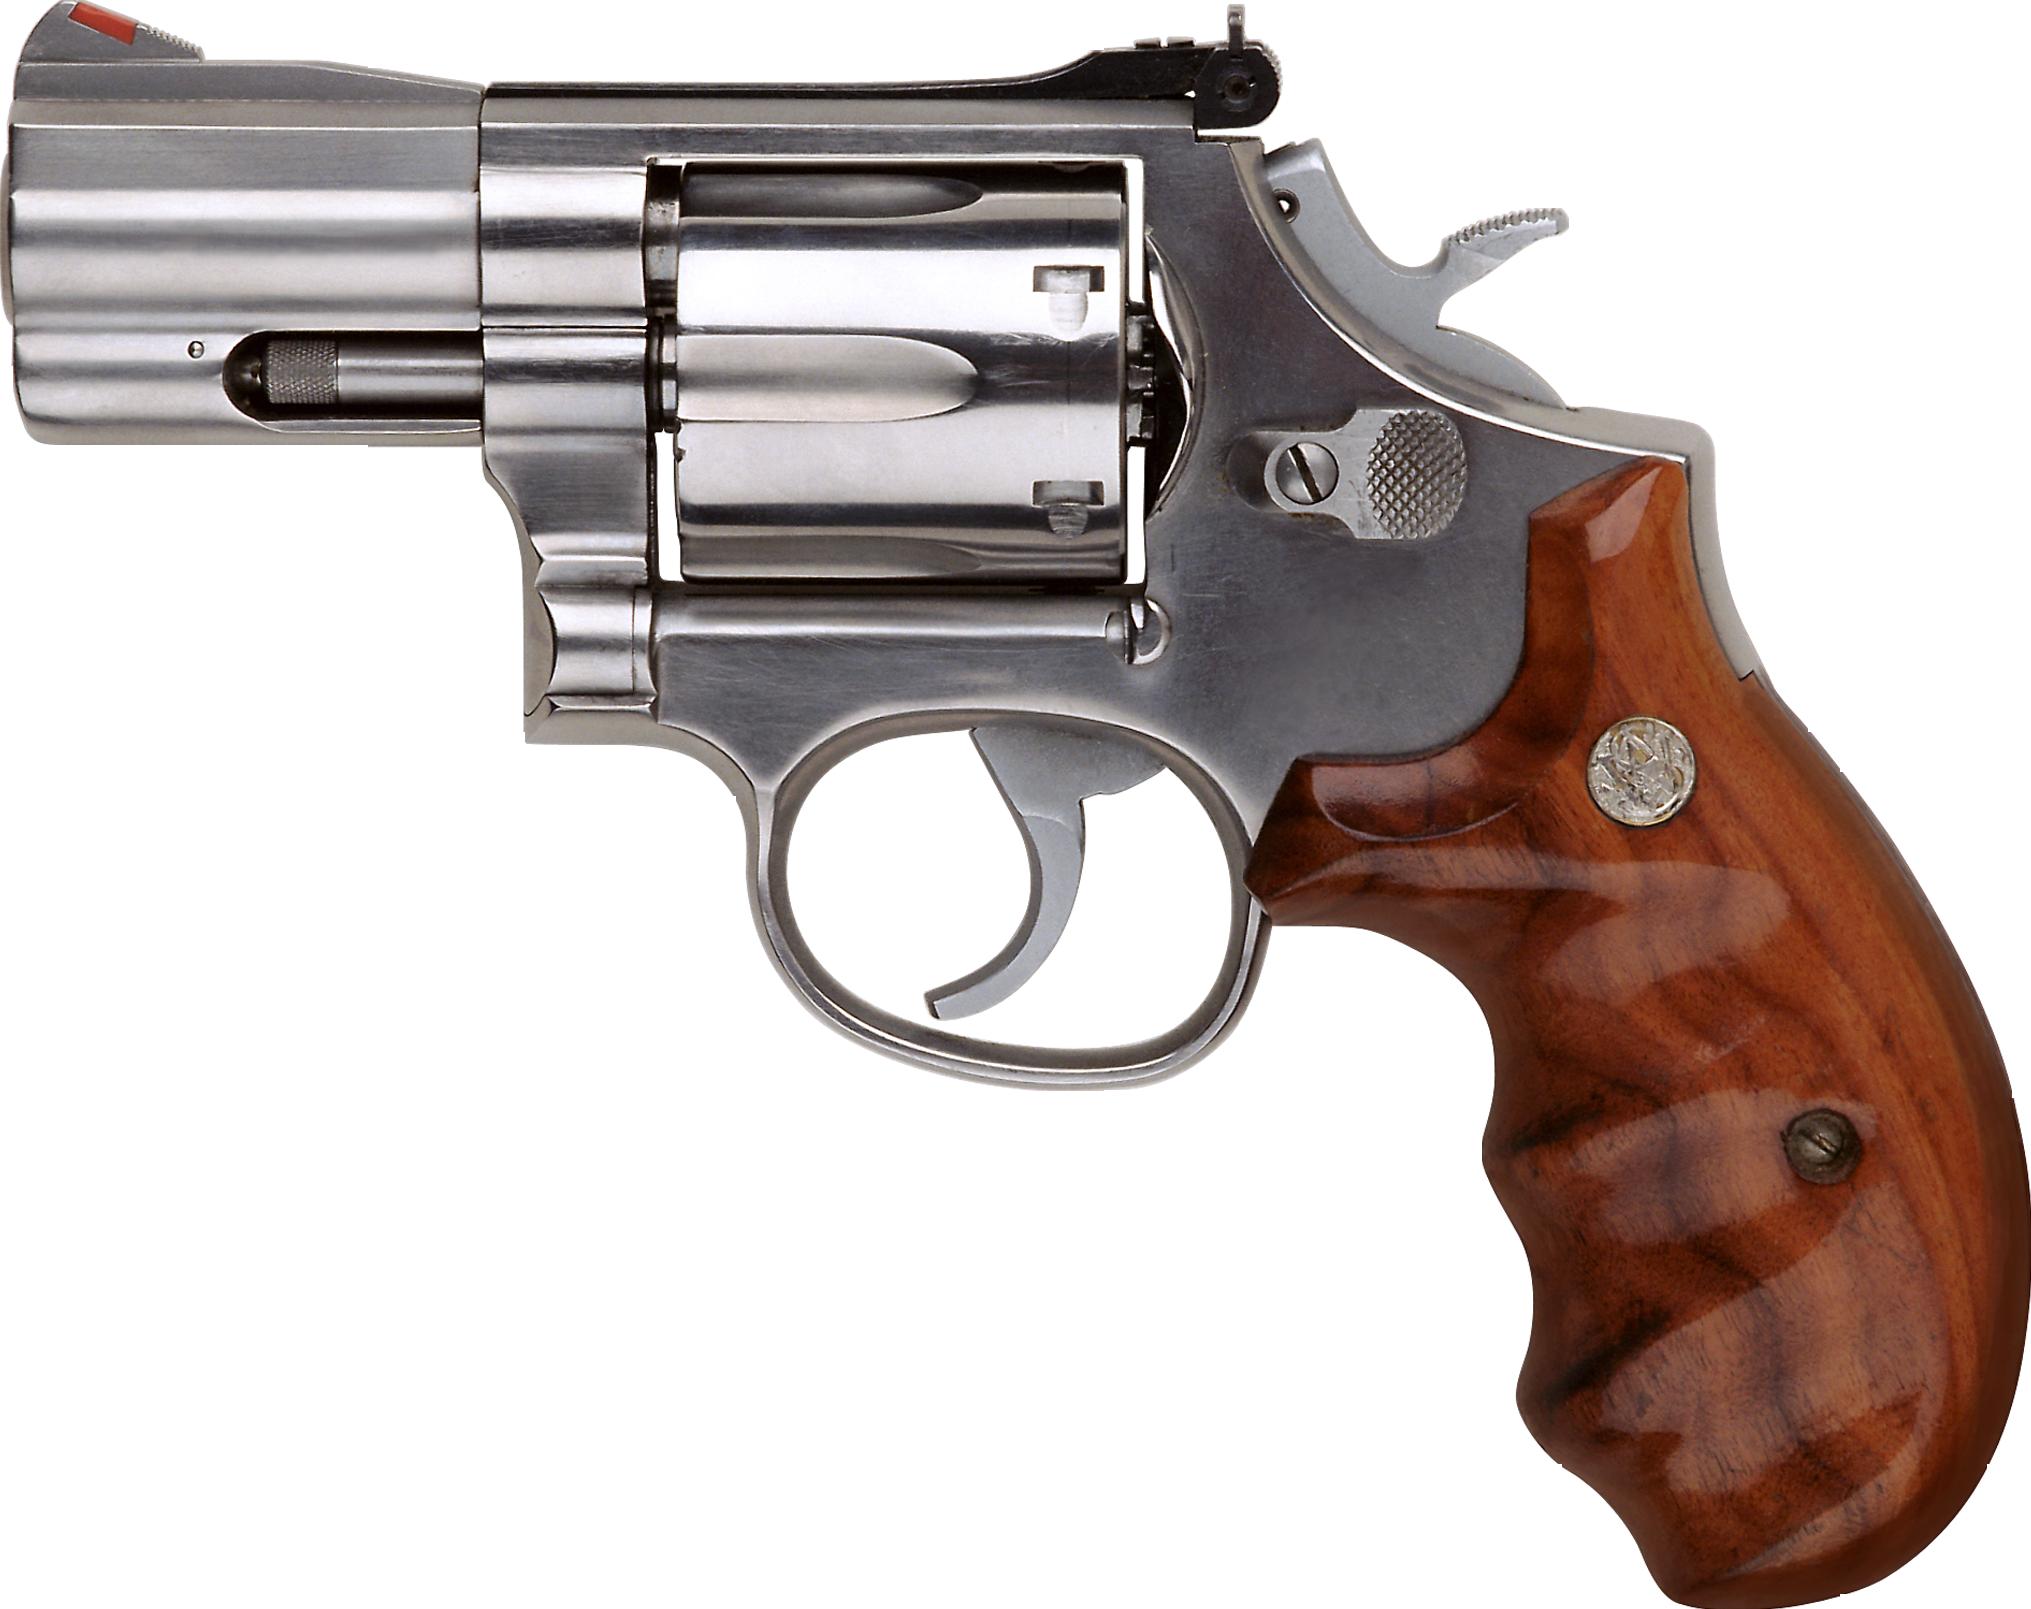 PNG image hand gun, gun images.